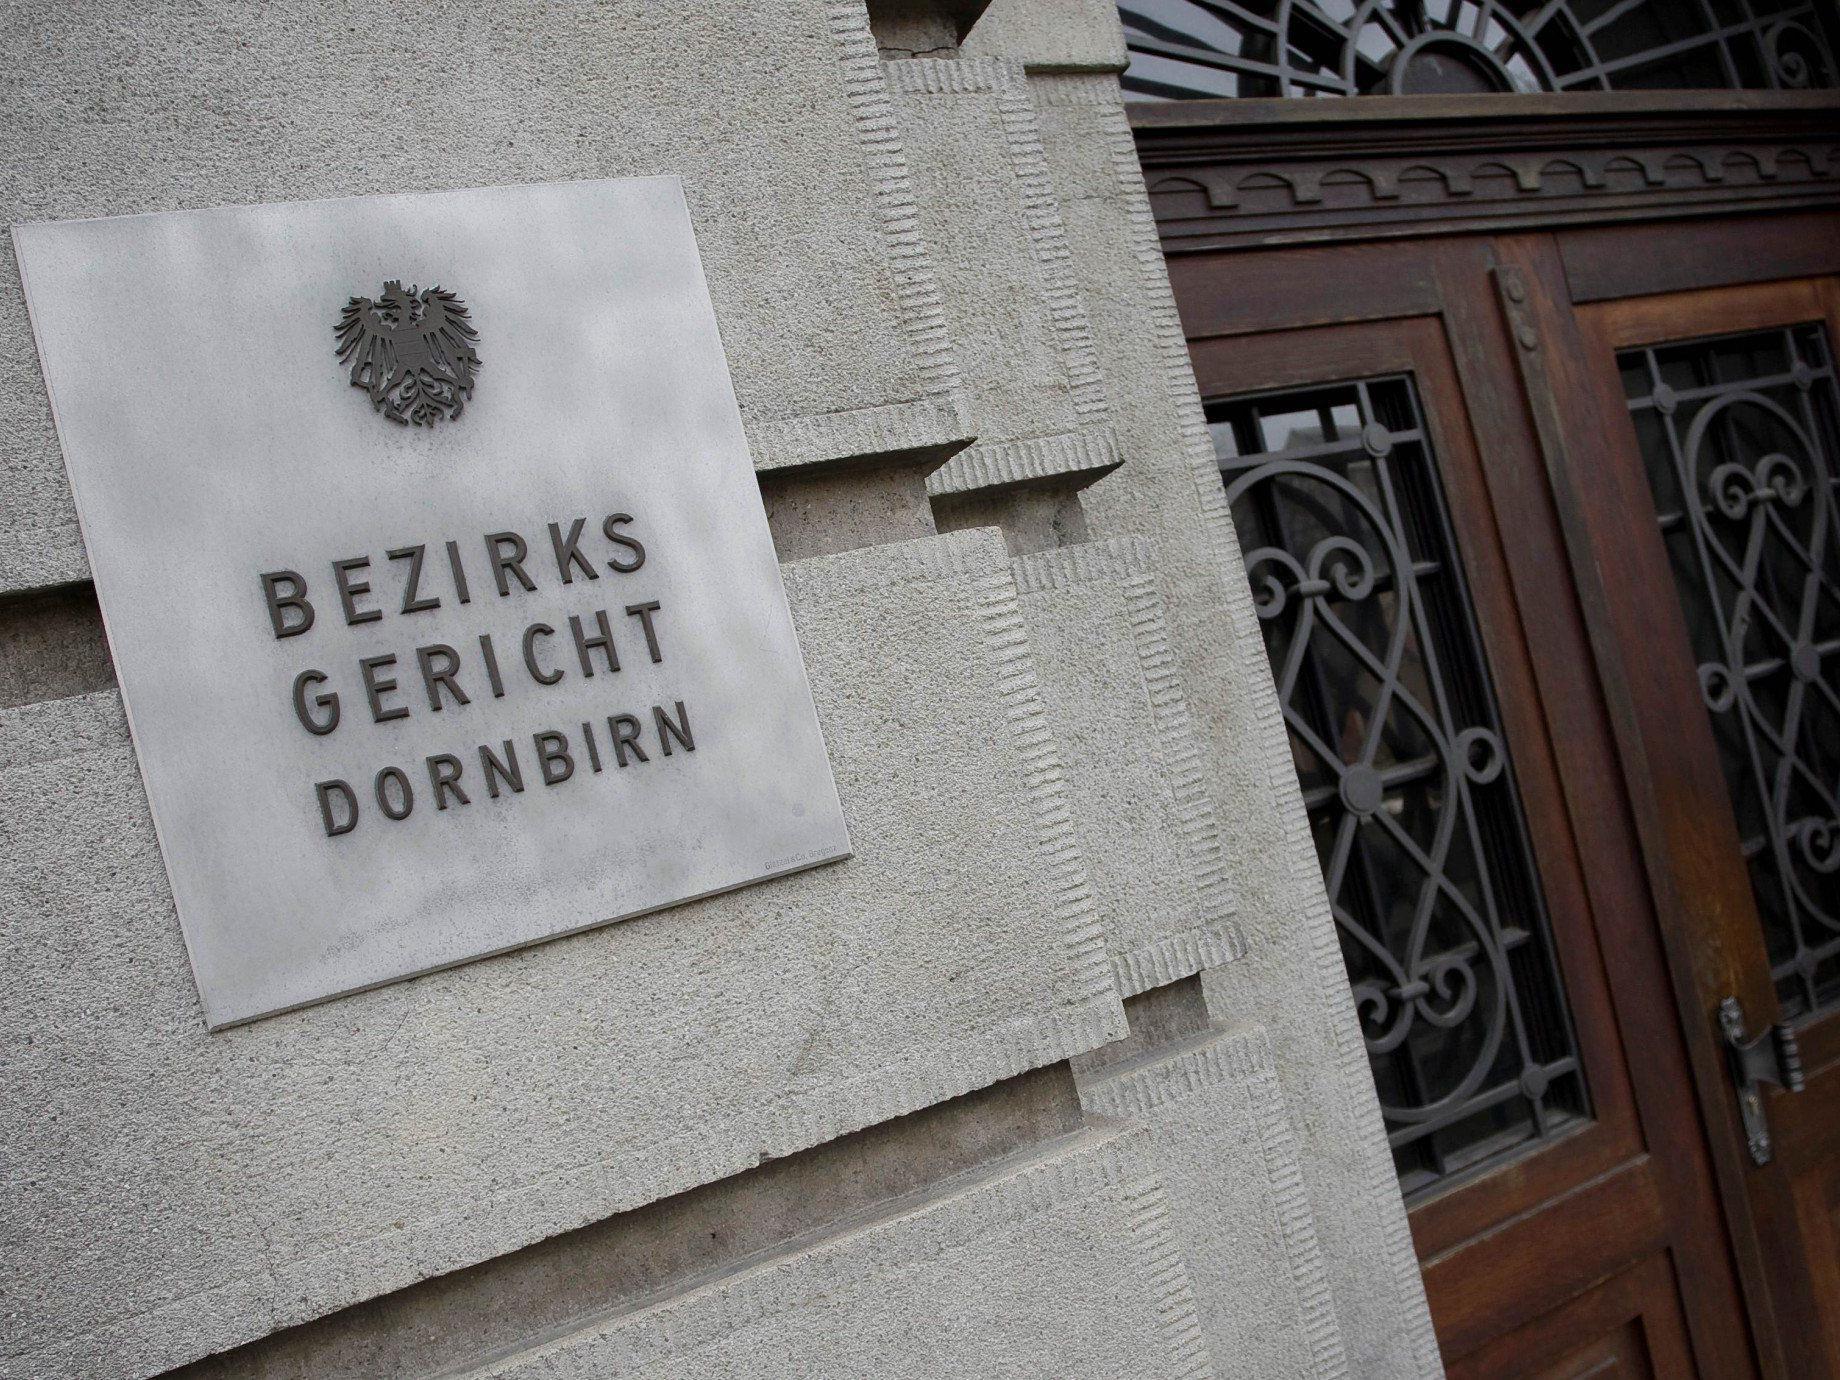 28-jährige Mutter am Bezirksgericht Dornbirn wegen Betrugs verurteilt.